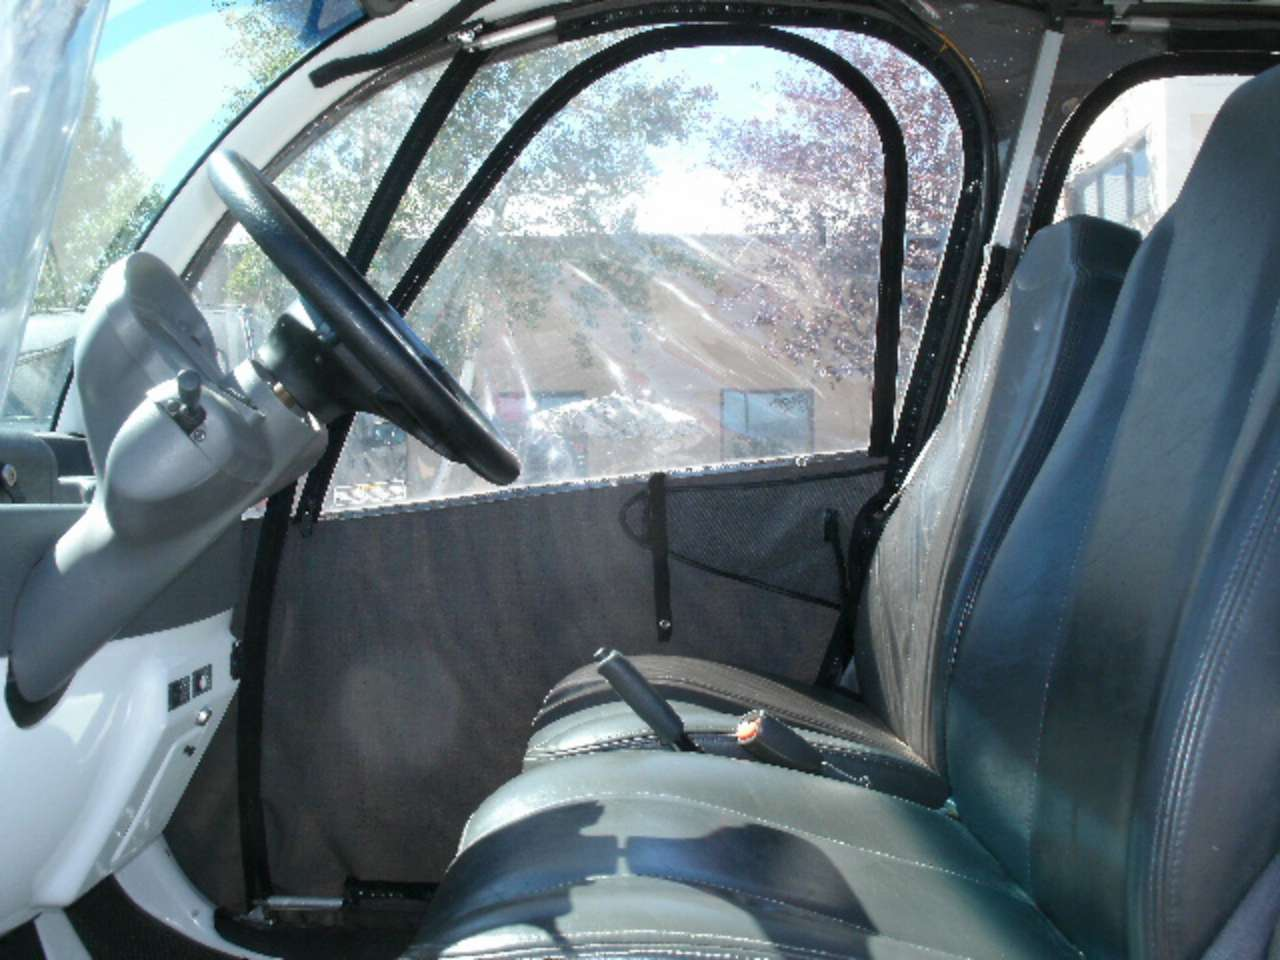 2007 GEM E4 Street Legal Electric Car @ $5,500   You Sell Auto